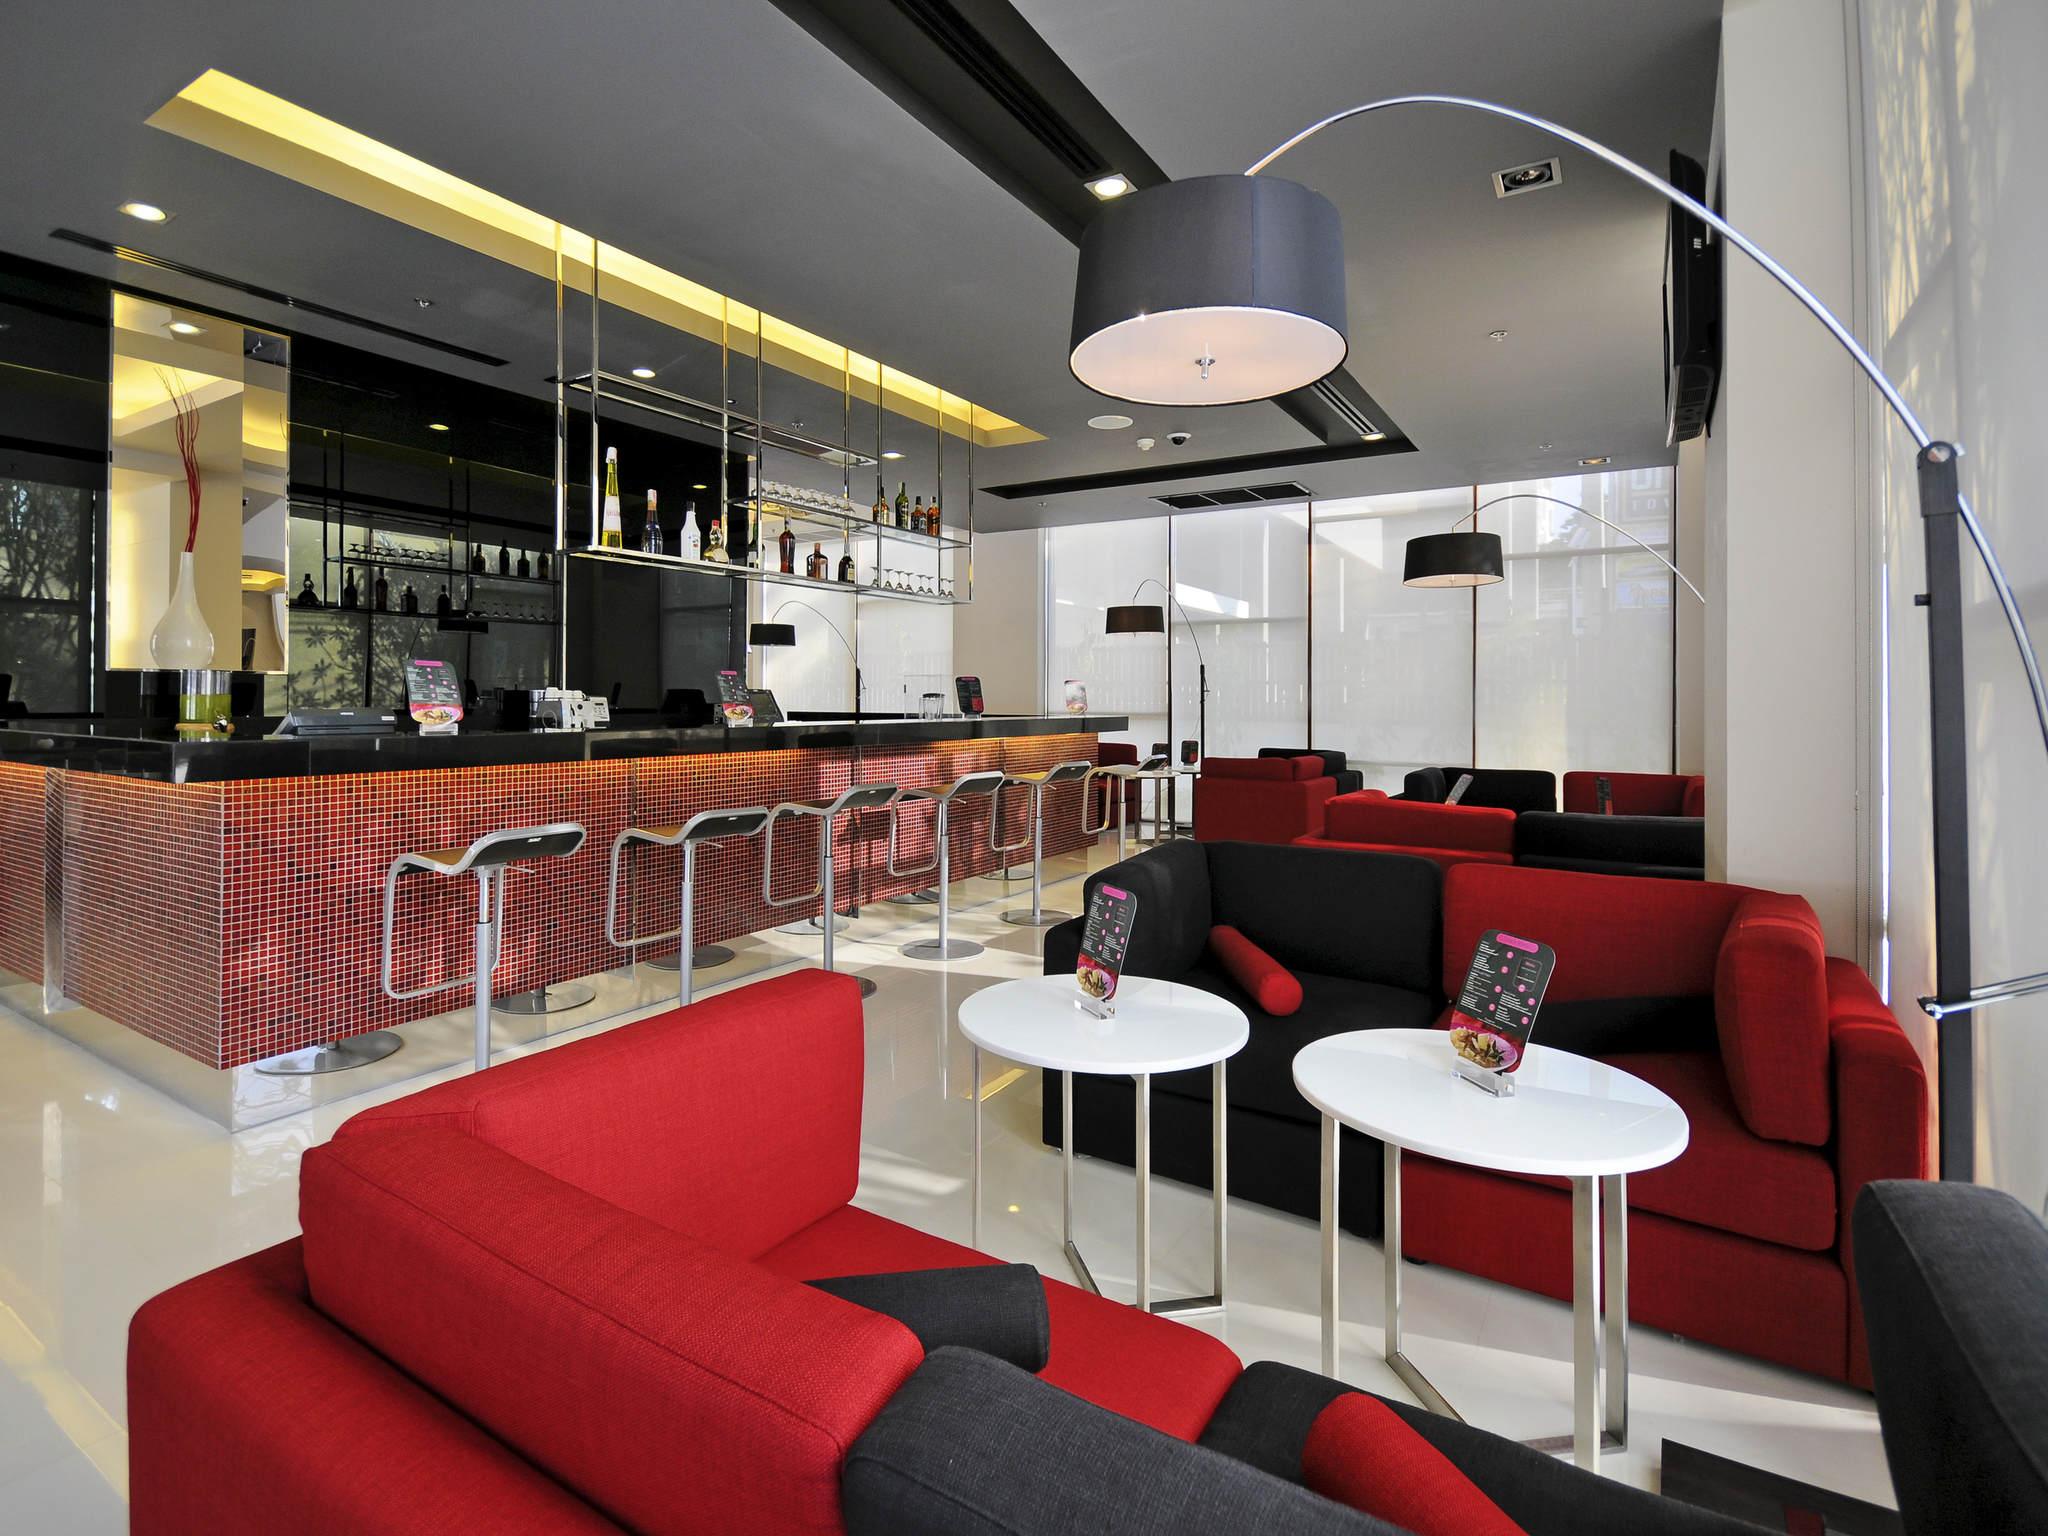 فندق - إيبيس ibis بانكوك سوكومويت 4